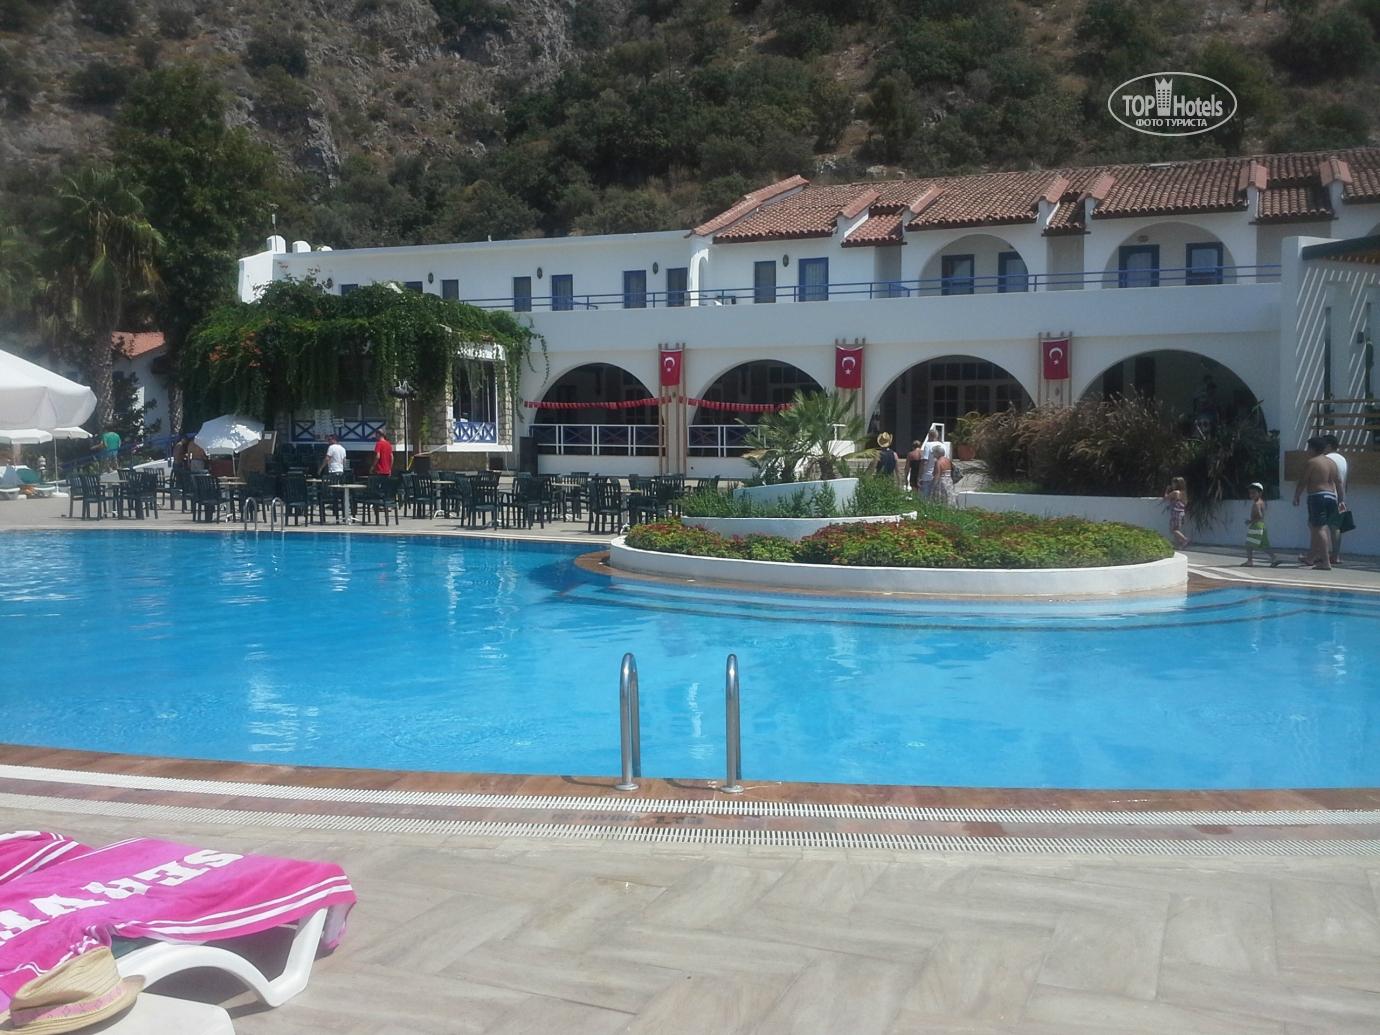 Oludeniz resort hotel pictures Kas Turkey : Travel Guide Info